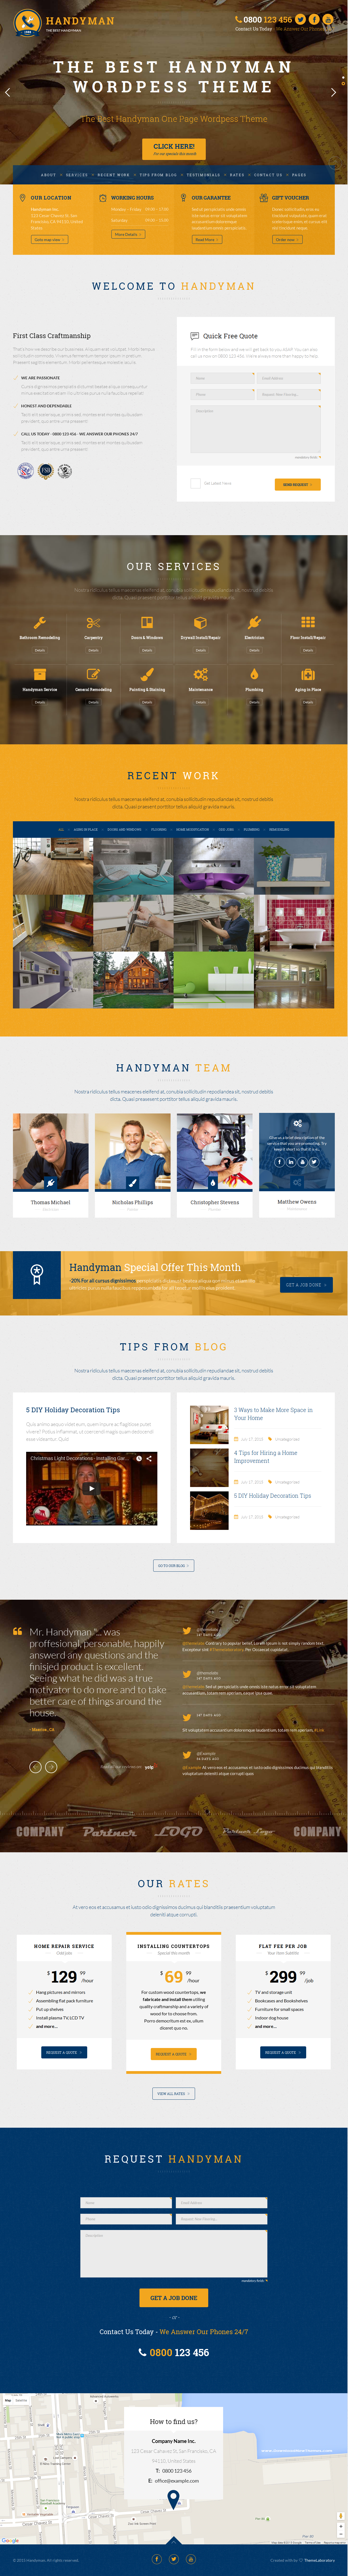 handyman craftsman business theme